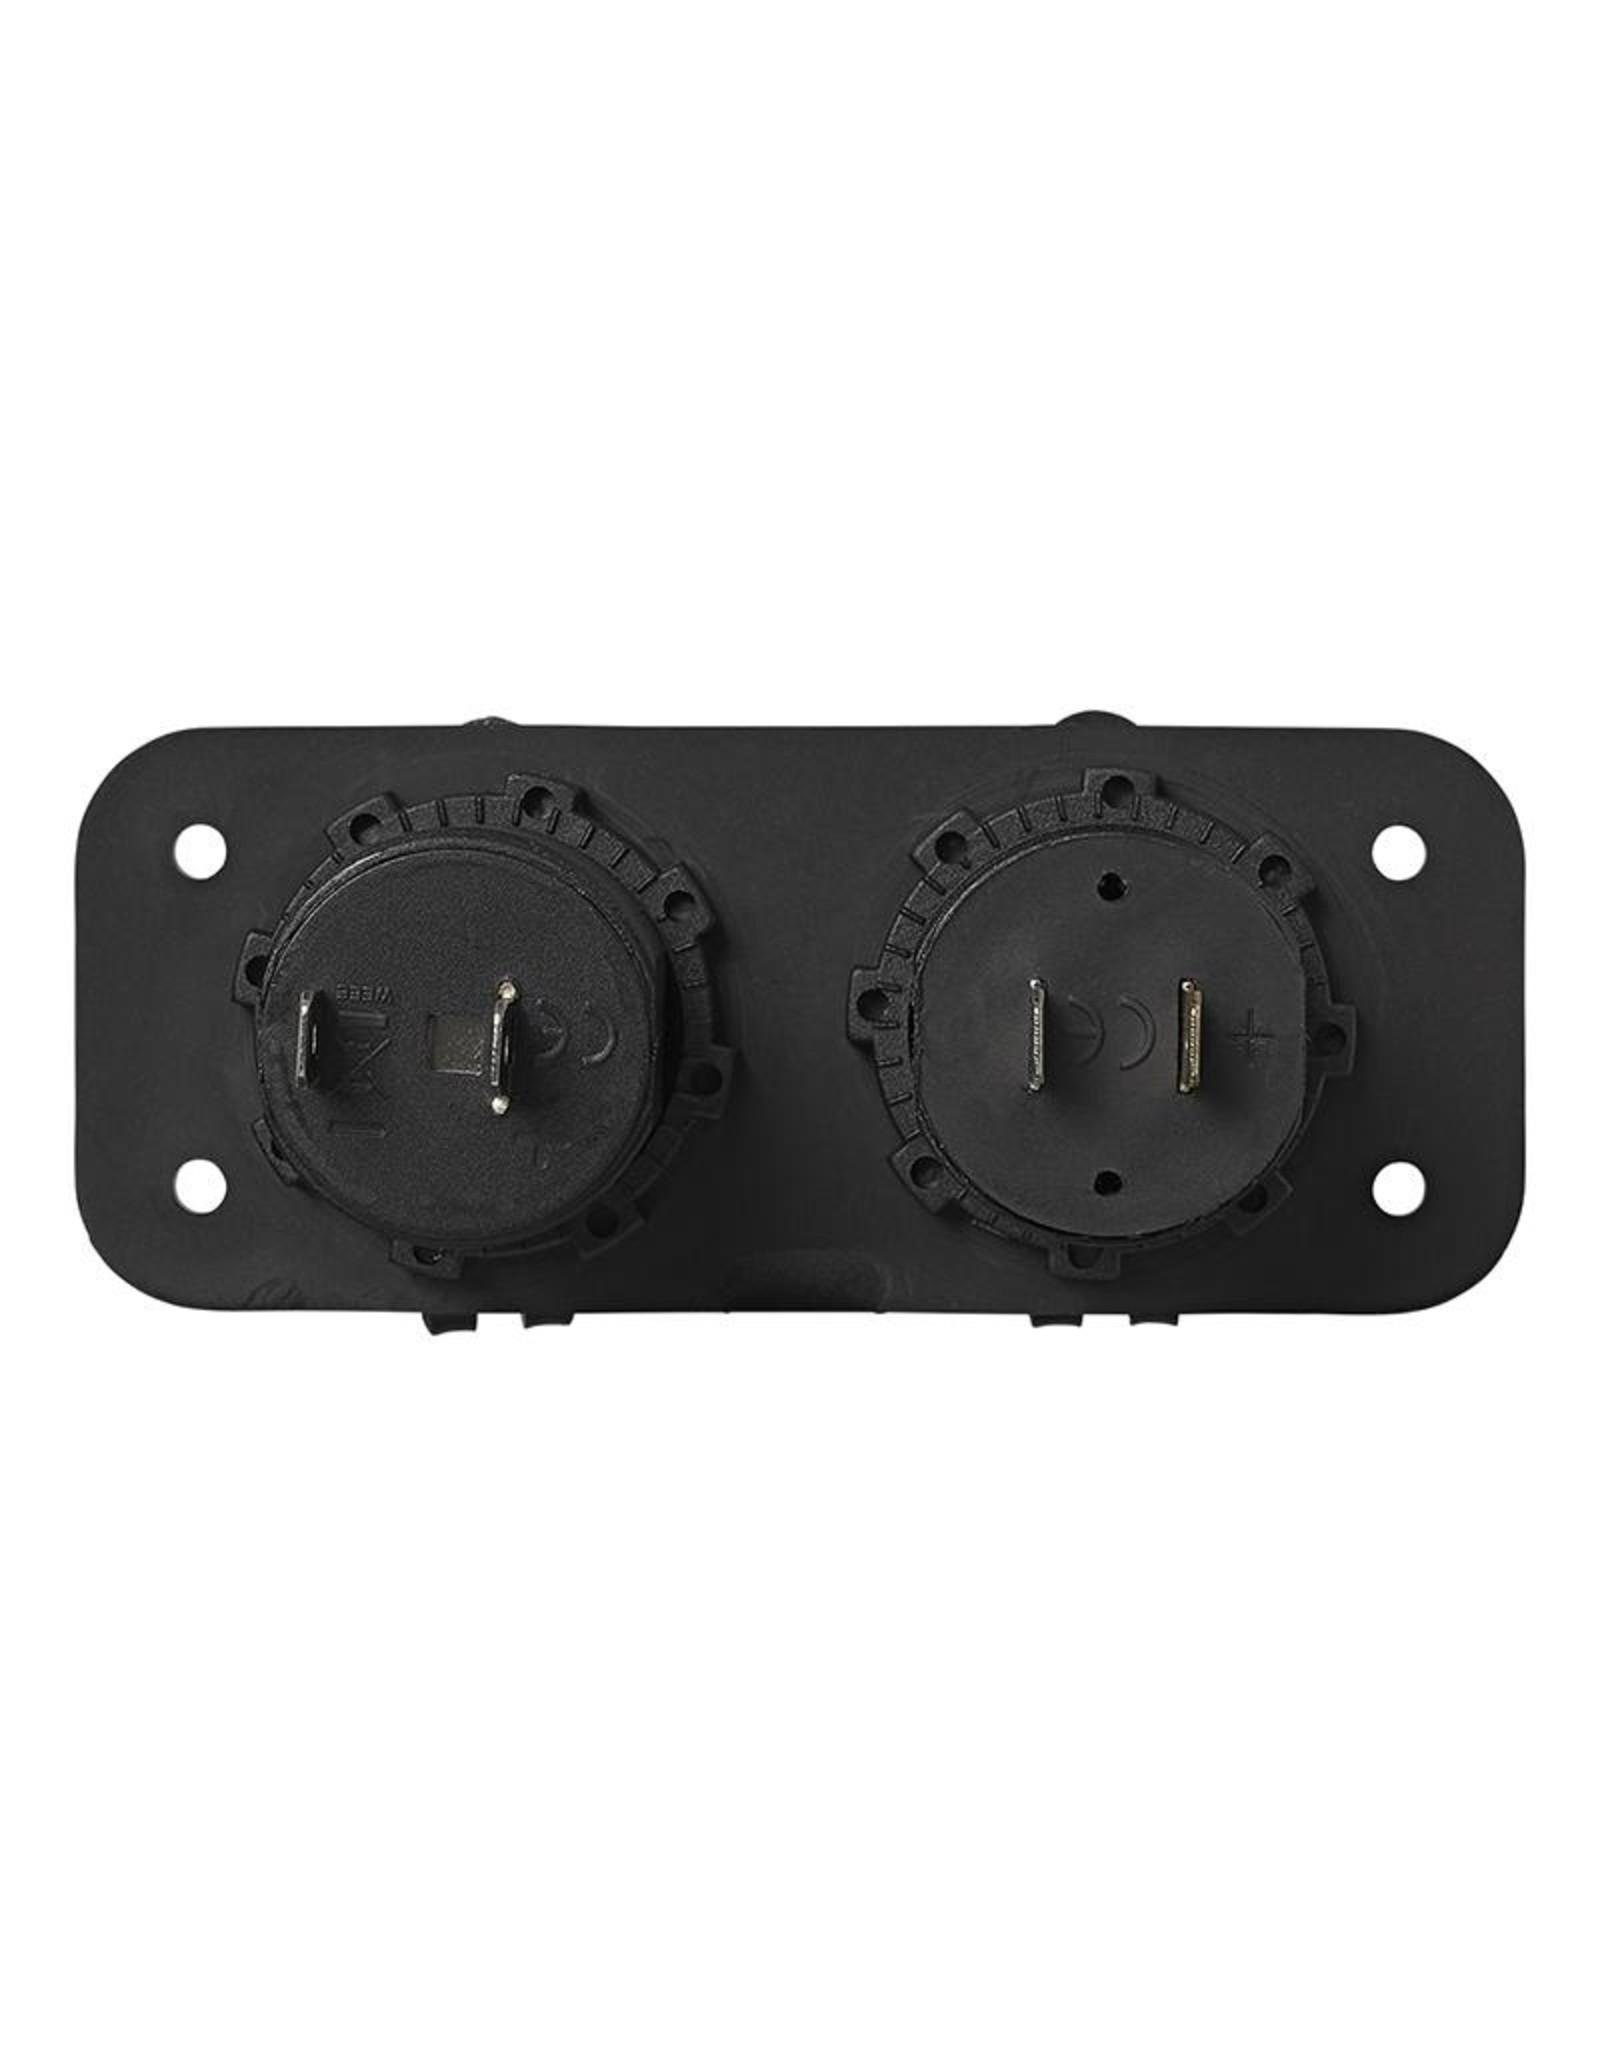 Inbouw kit: stekkerdoos DIN + USB poort dubbel 2x2100mA